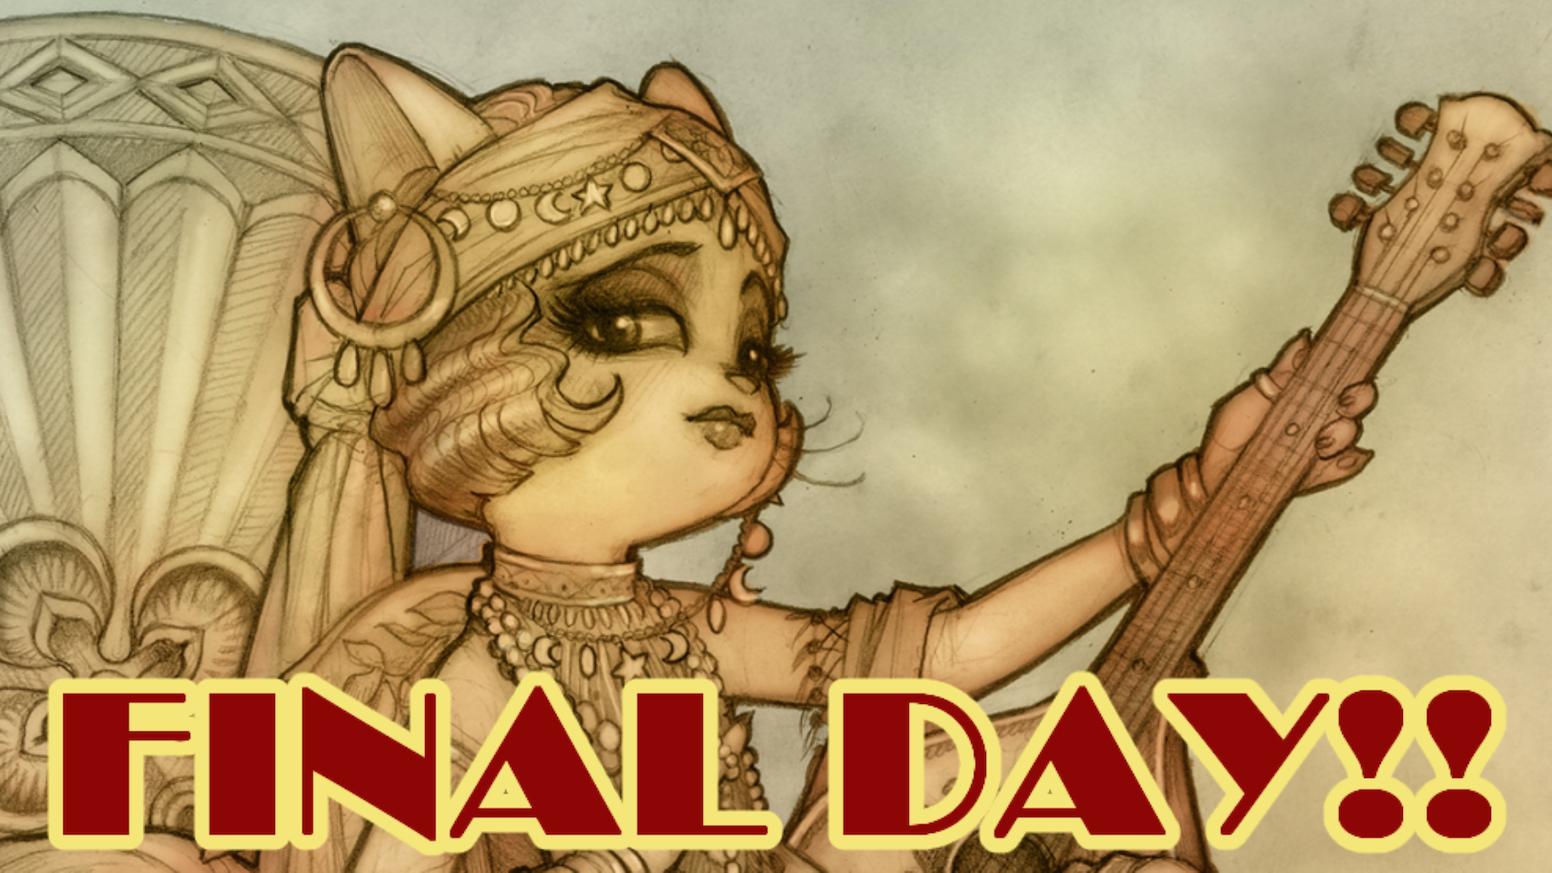 An incredible art book FULL of Lackadaisy Cats minicomics and extras, with an eye on funding a Lackadaisy animated short!